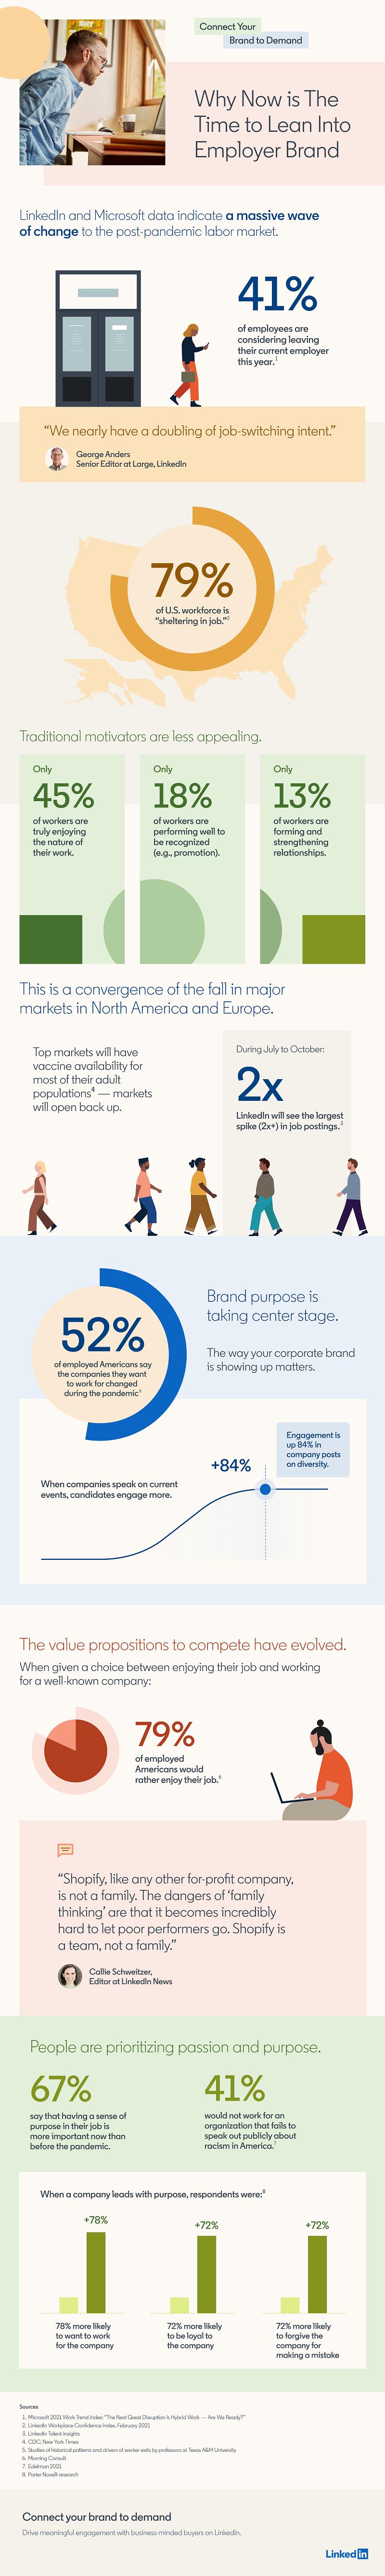 LinkedIn staffing shift infographic